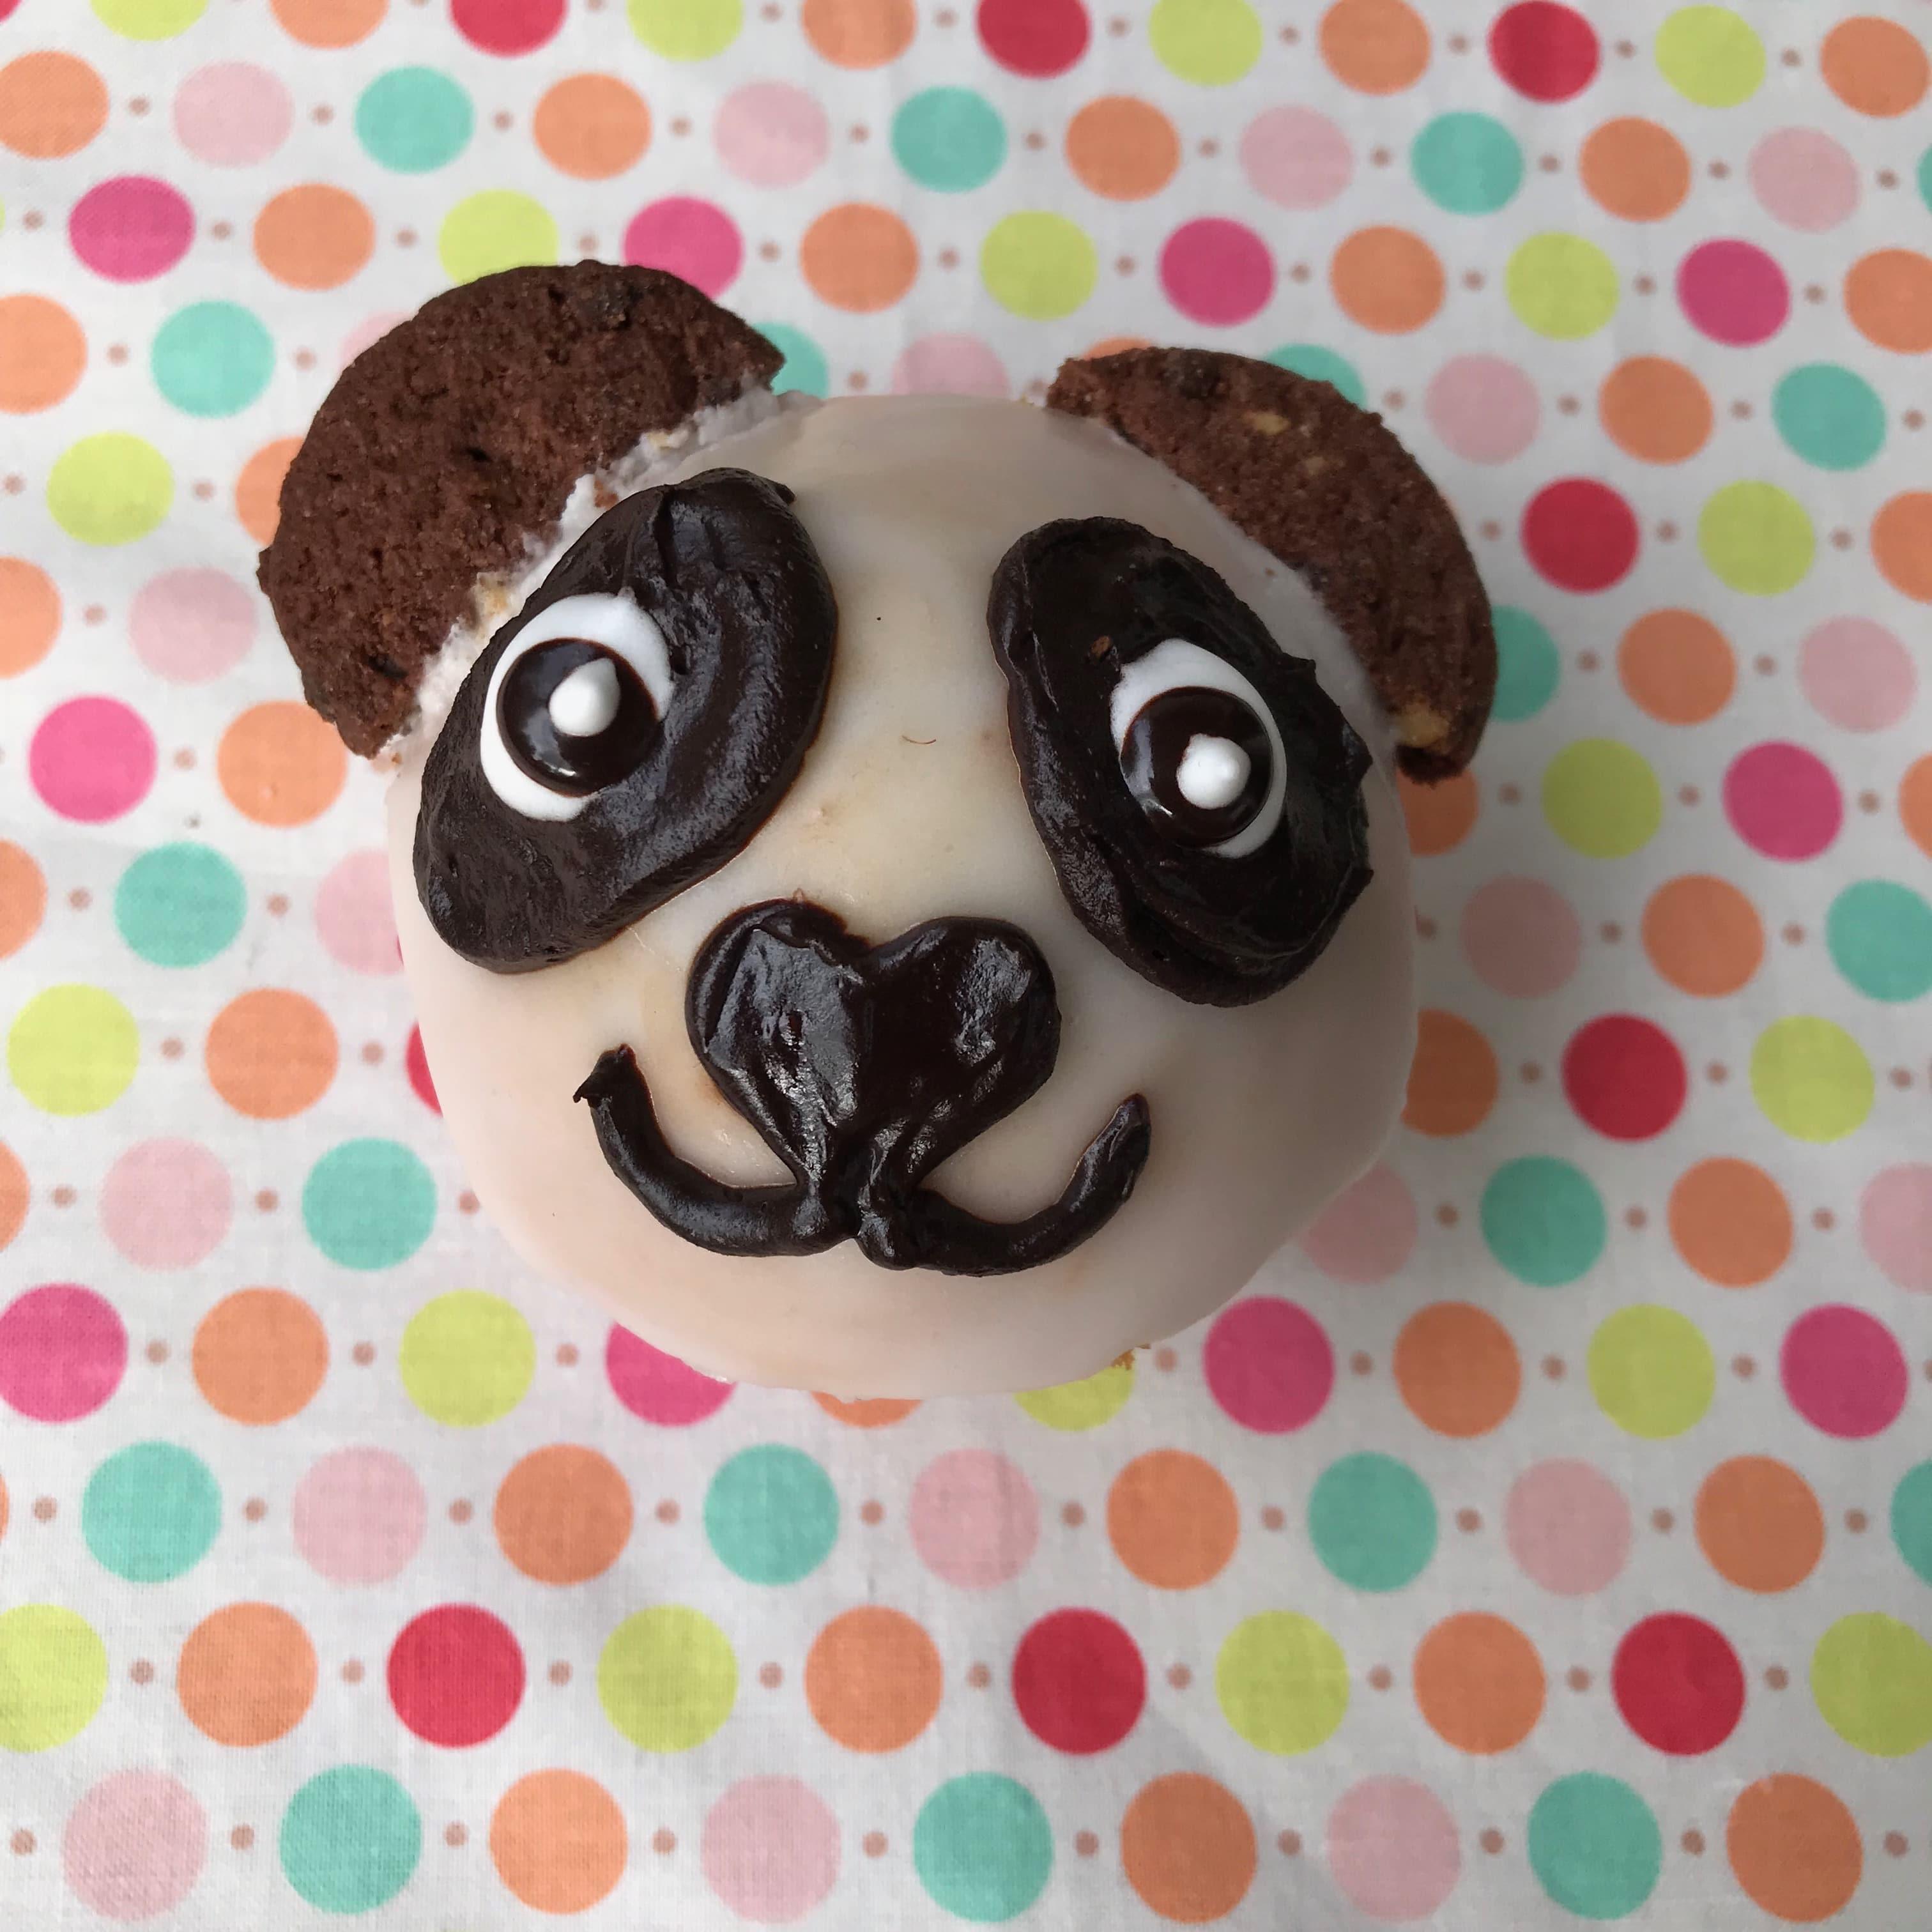 Lustige Muffins, Pandabaer, Tier Party, Essen